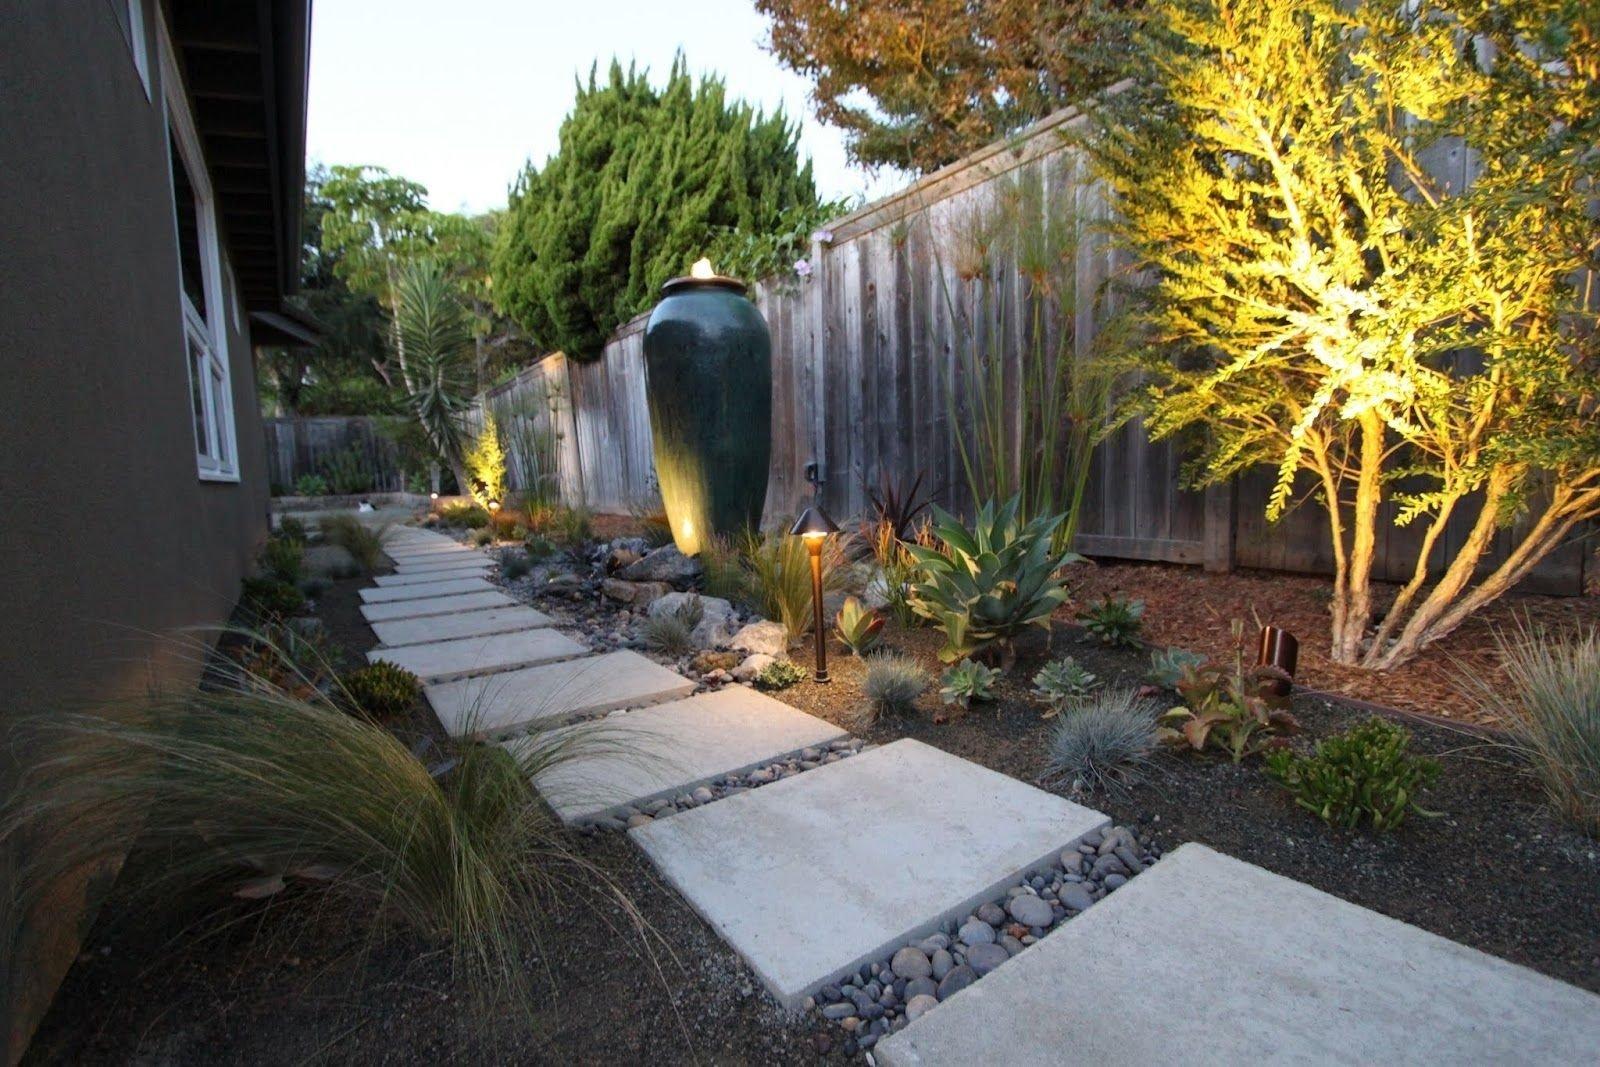 10 Nice Mid Century Modern Landscape Design Ideas mid century modern backyard ideas lighting a mid century modern 2021